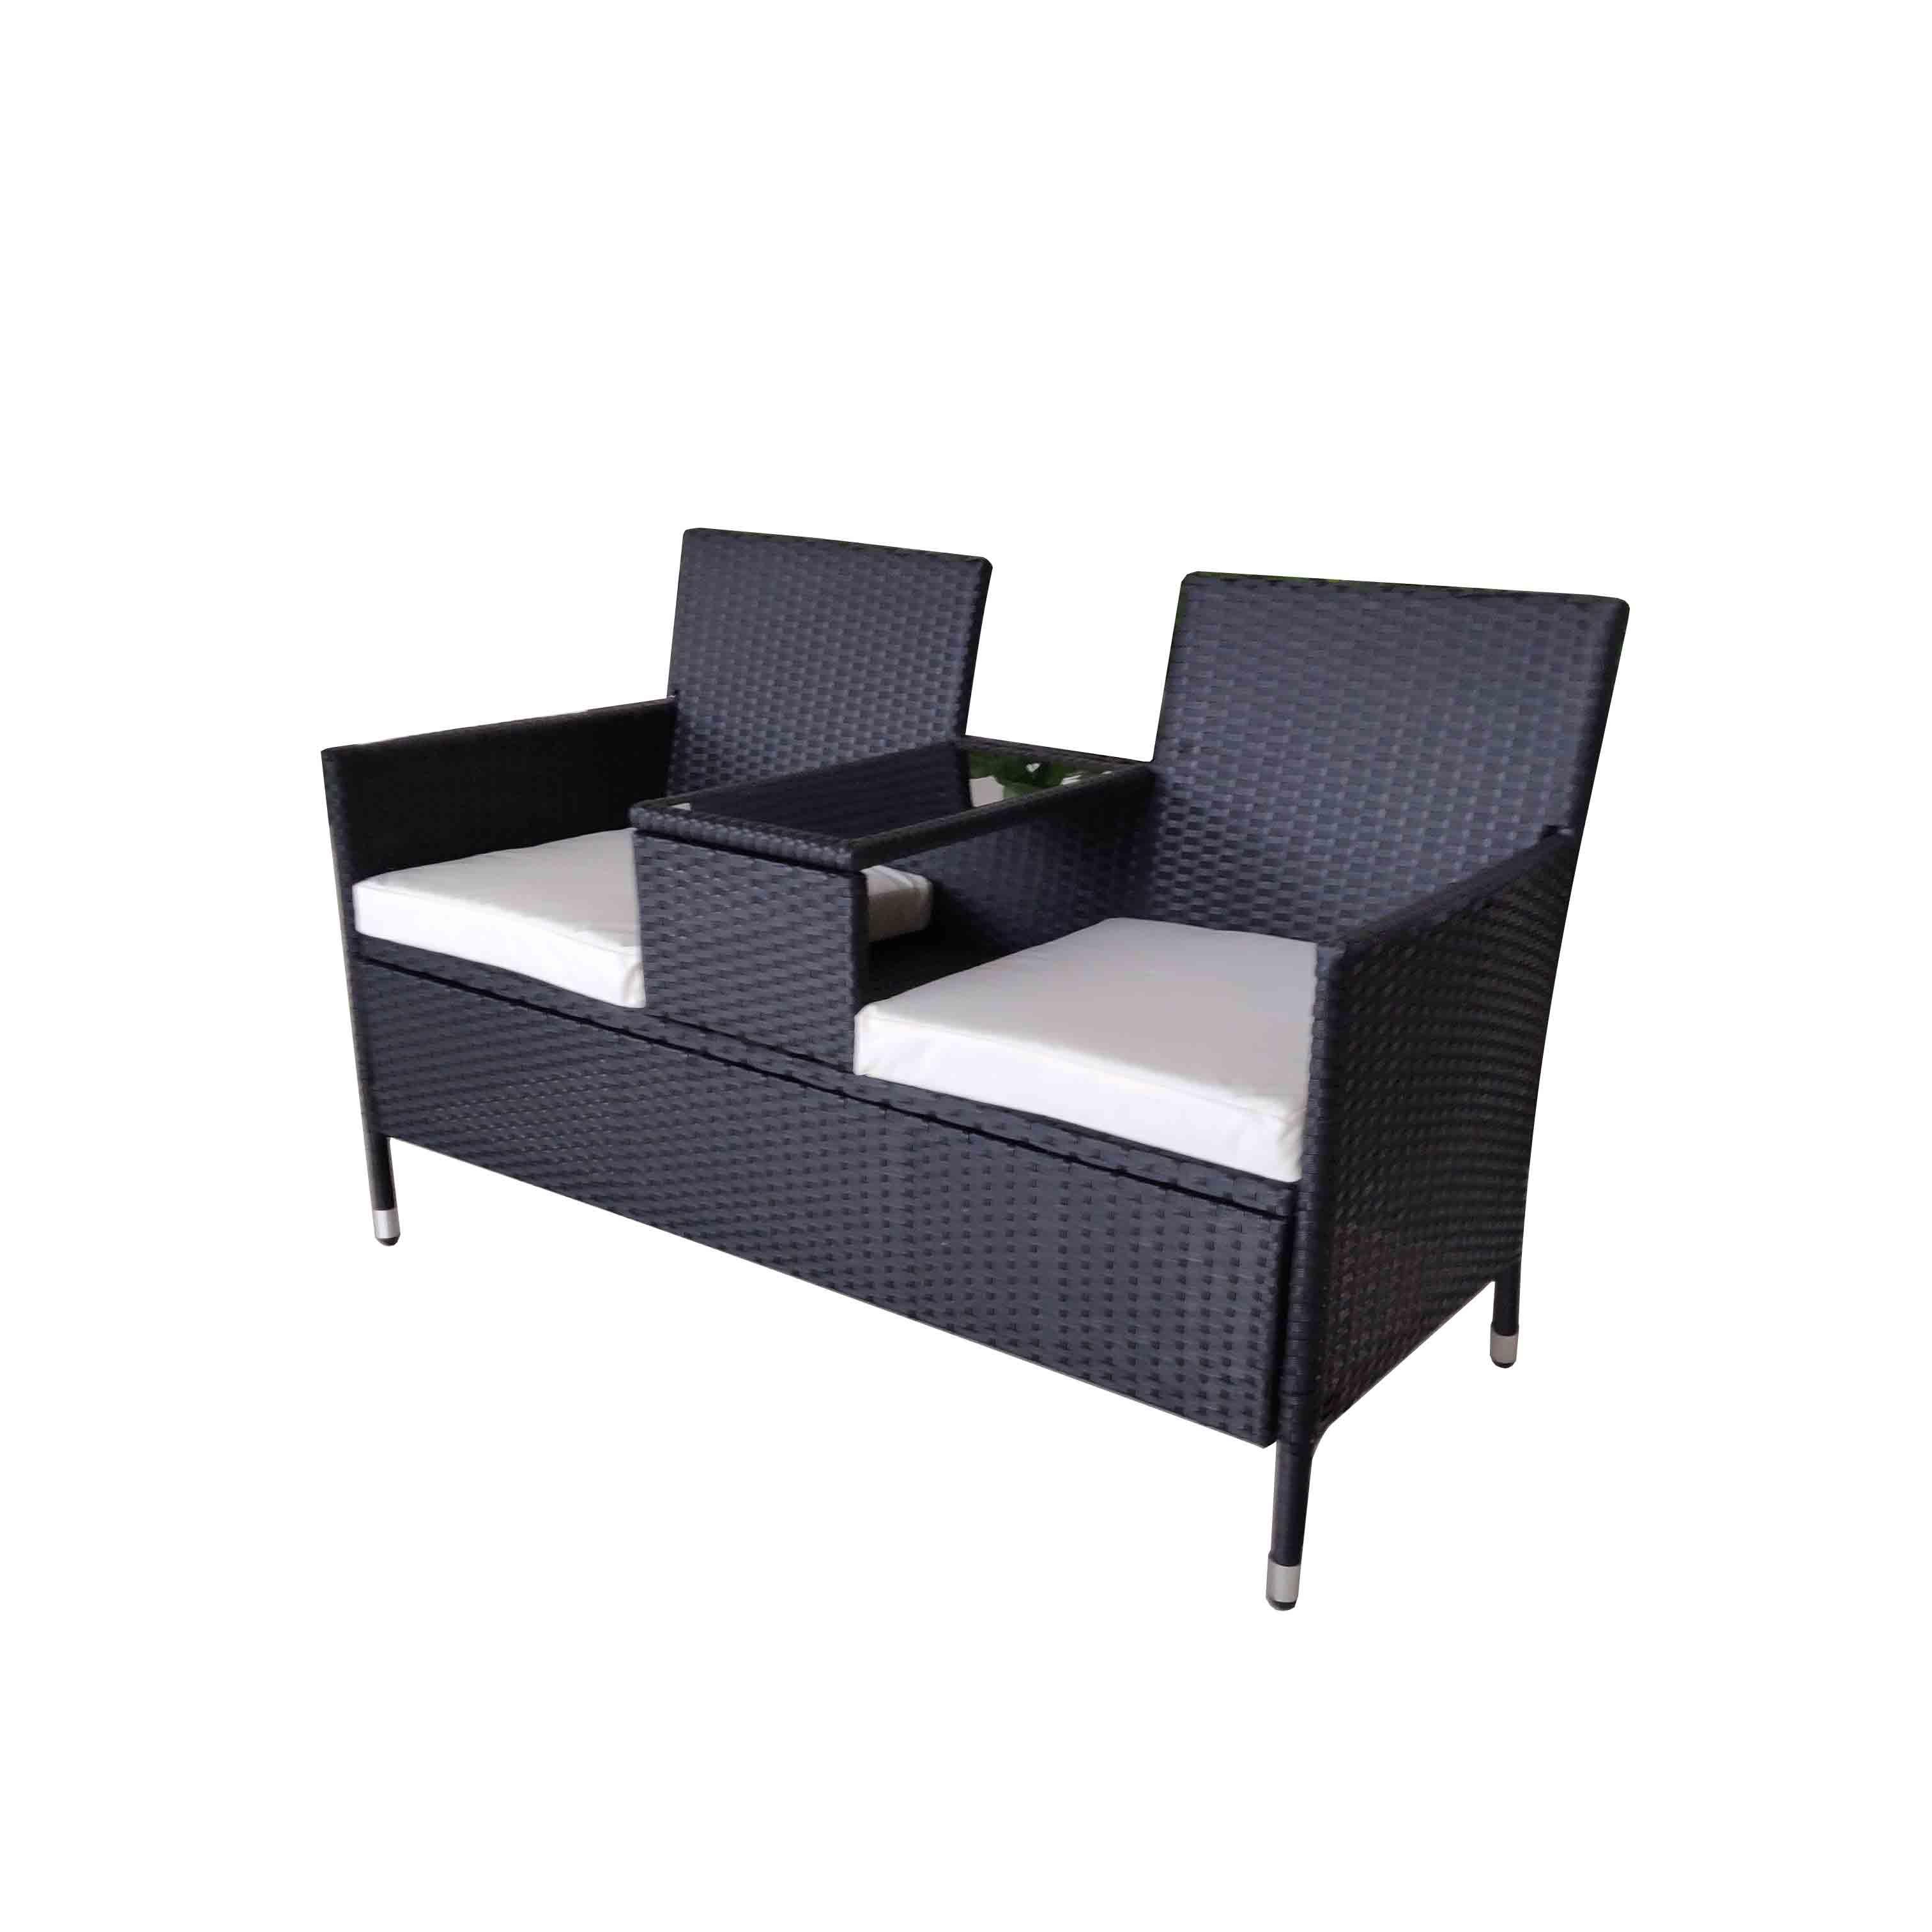 Hot Sale for Small Folding Picnic Table - JJC3188W Steel rattan loveseat – Jin-jiang Industry